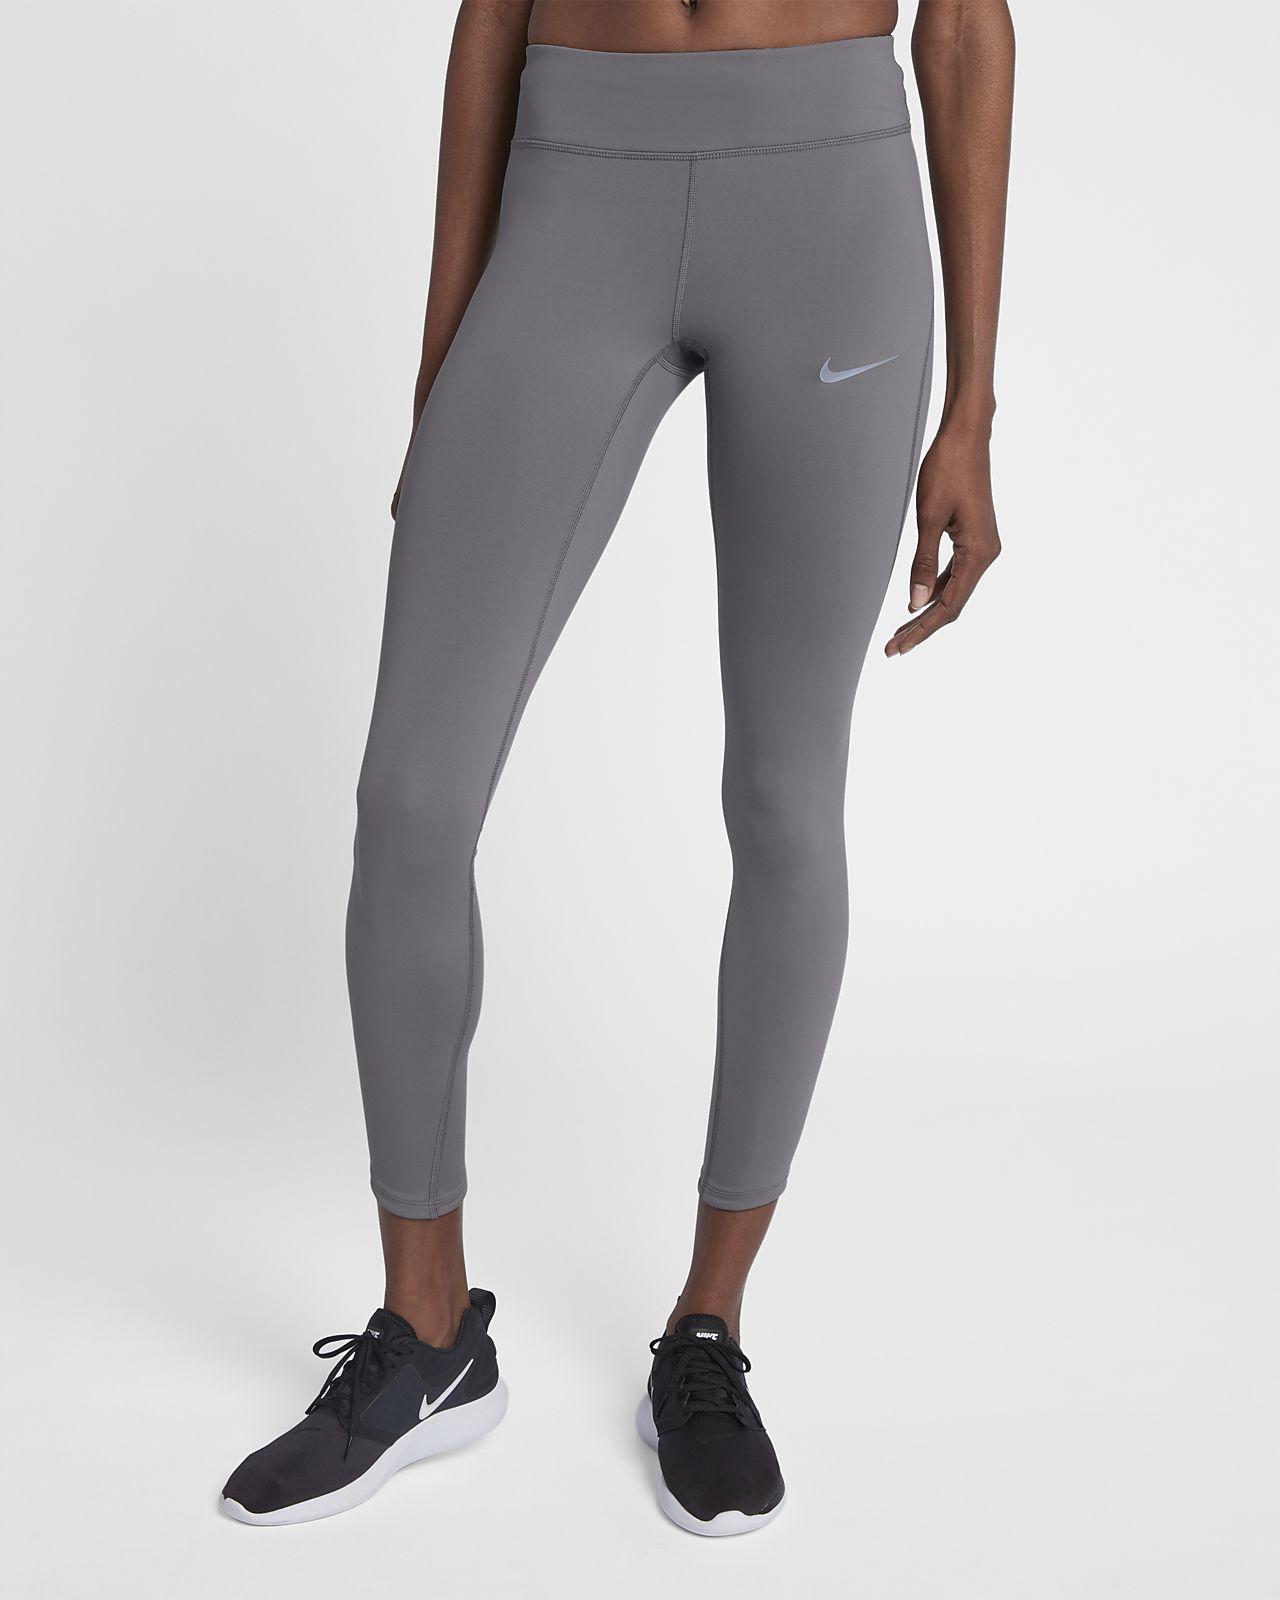 Mallas de running de tiro medio para mujer Nike Epic Lux